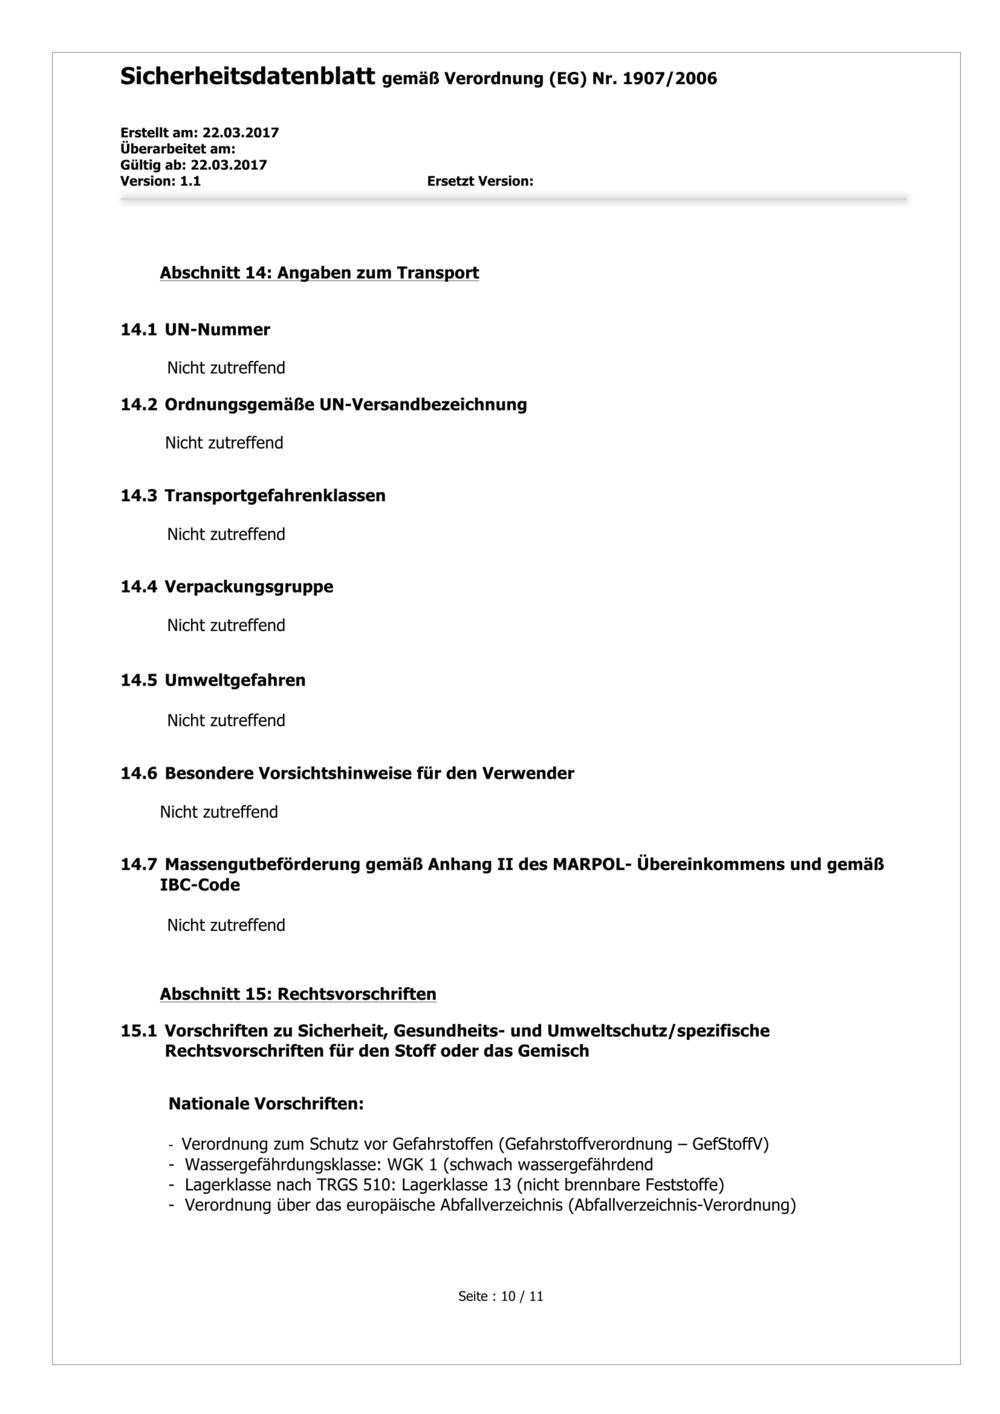 MSDB_MC40-10.png